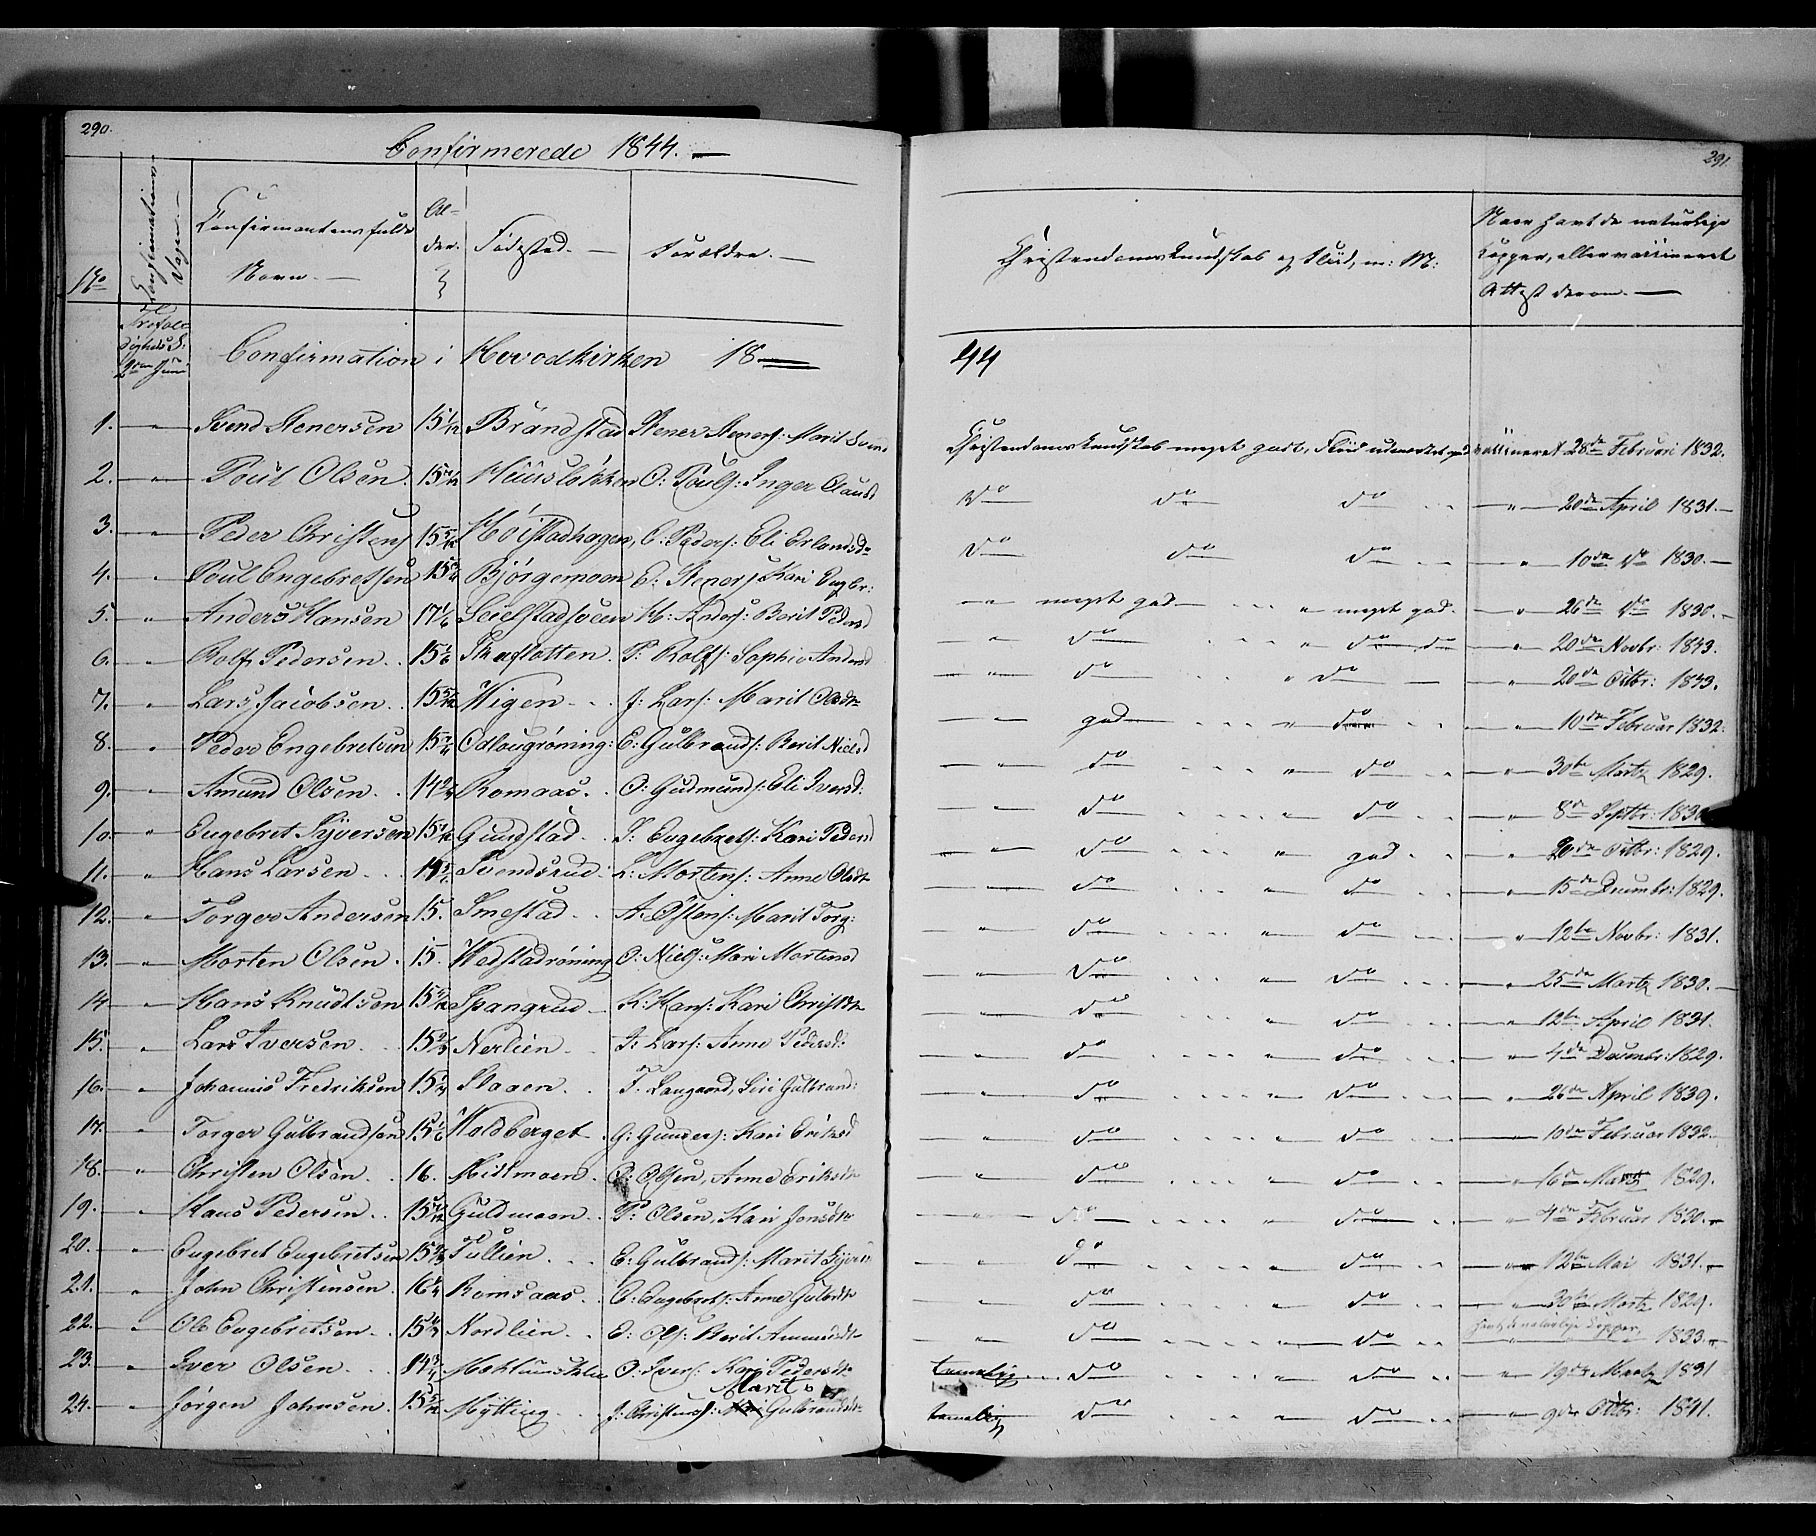 SAH, Ringebu prestekontor, Ministerialbok nr. 5, 1839-1848, s. 290-291